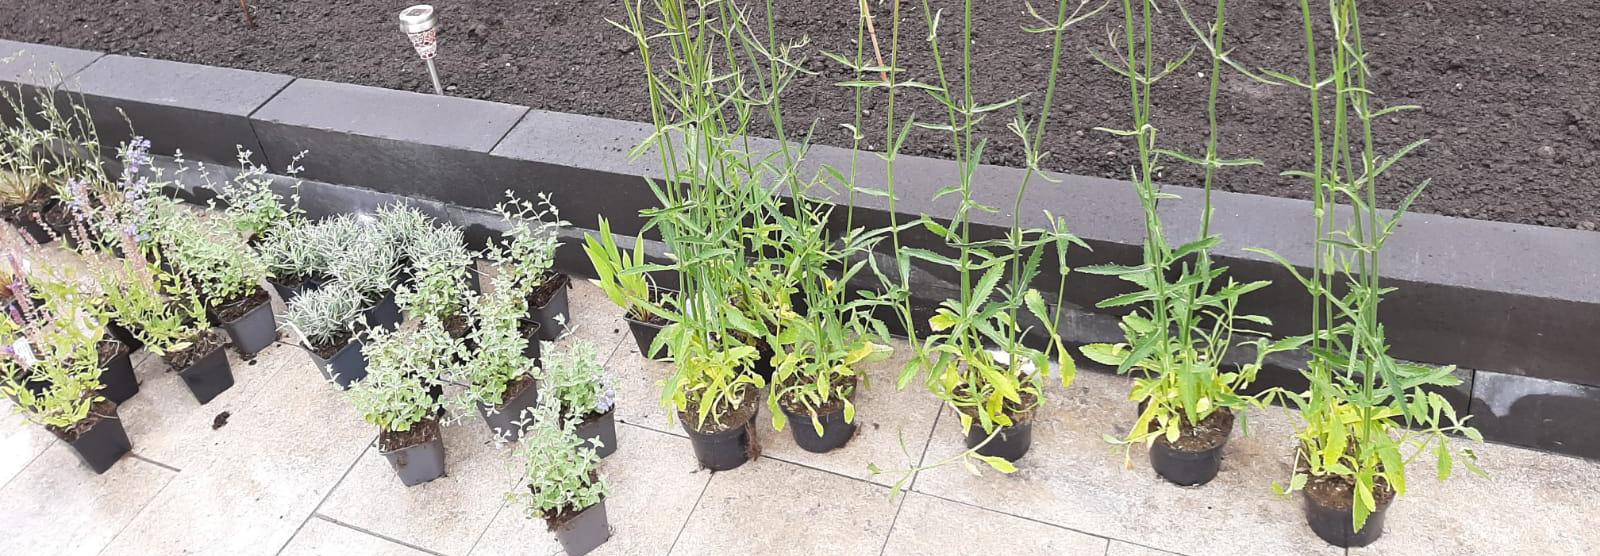 borderpakketten tuinplanten borders